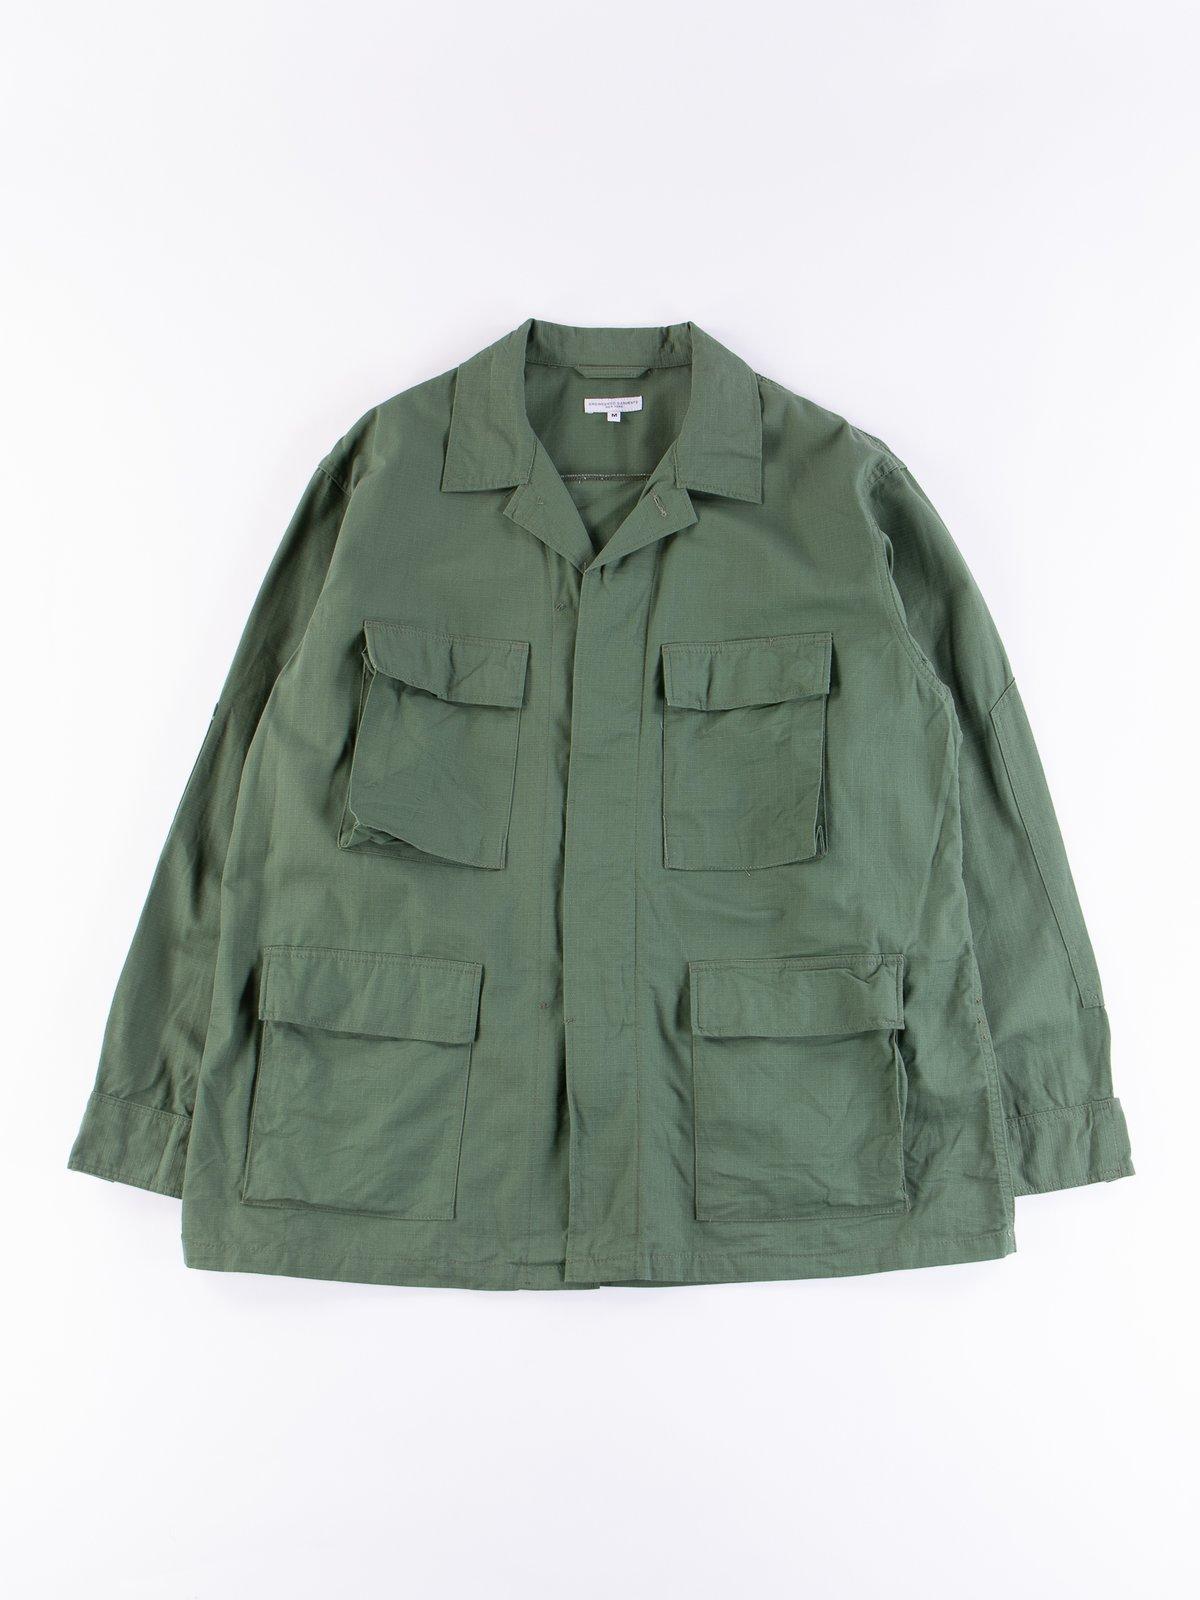 Olive Cotton Ripstop BDU Jacket - Image 1